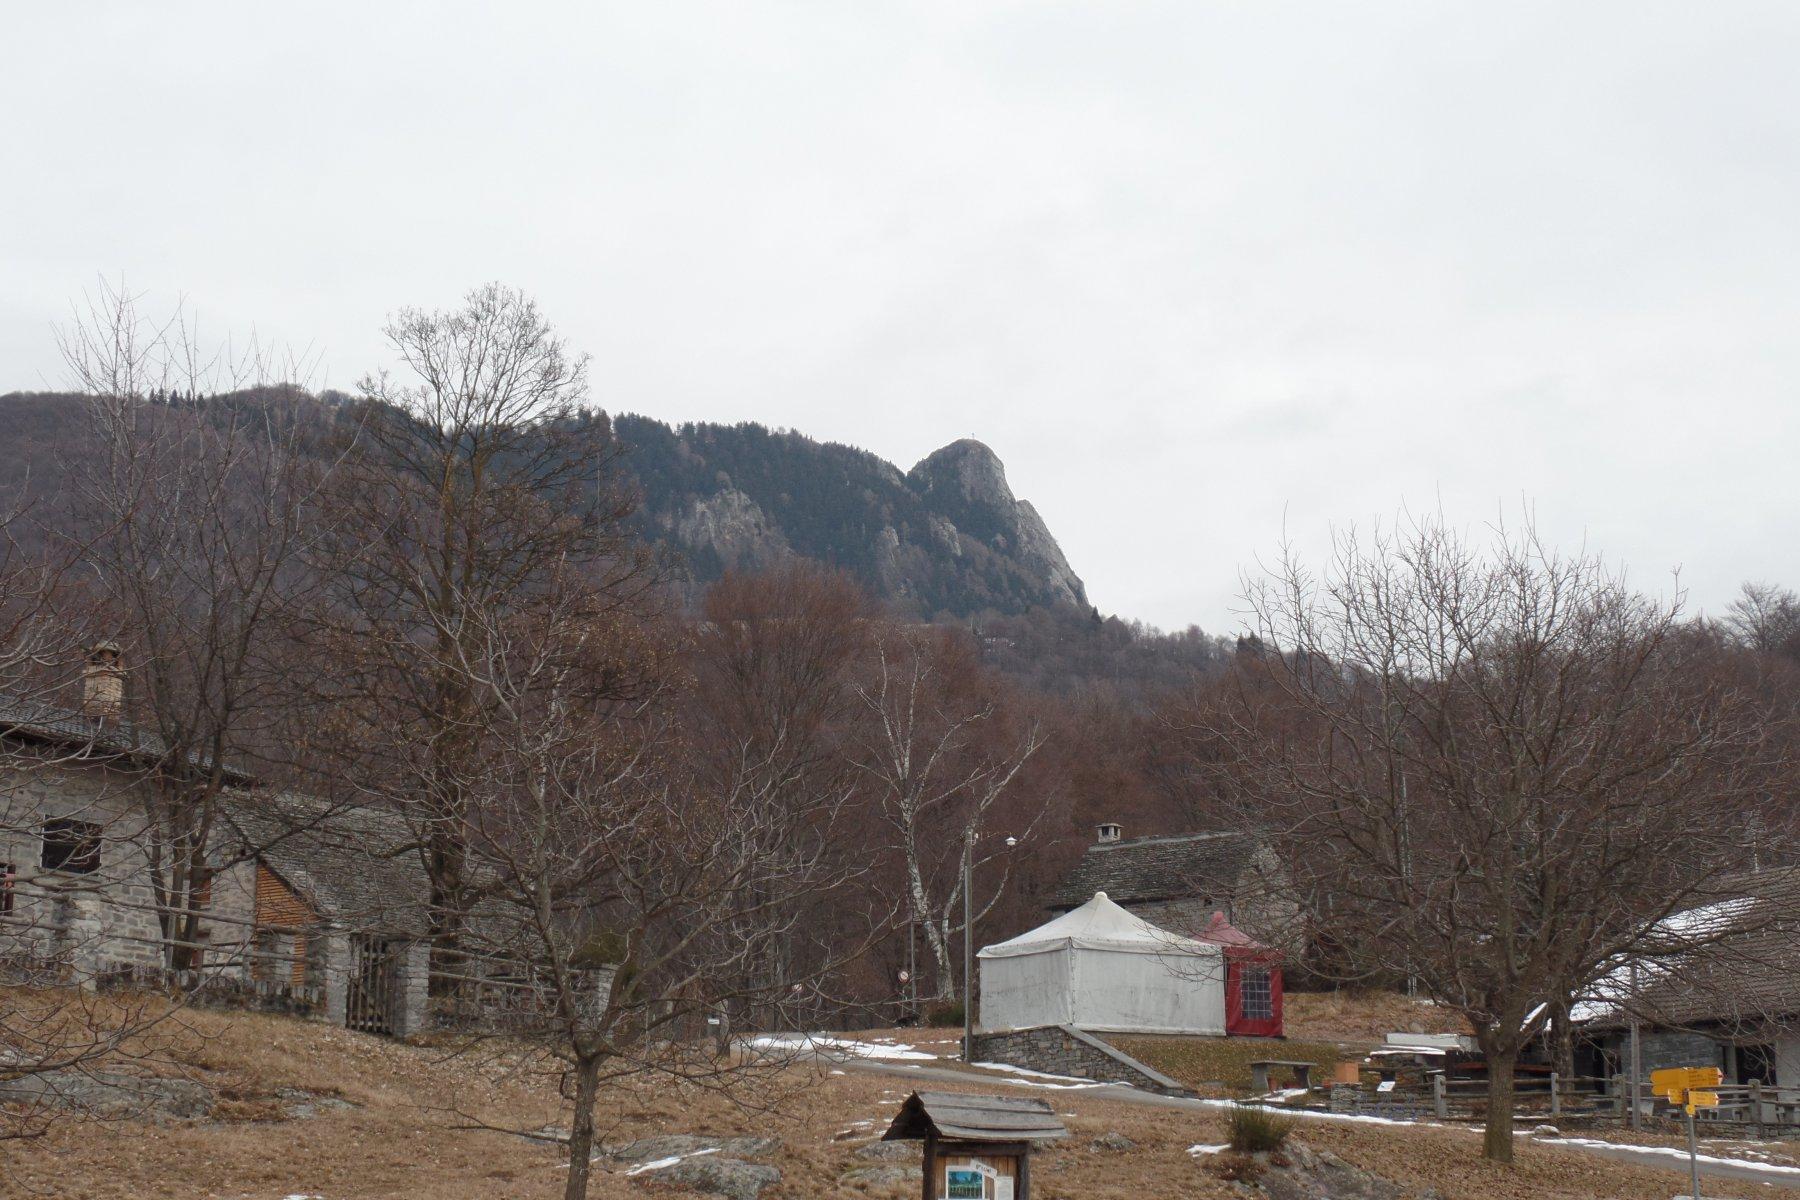 Monti di Motti